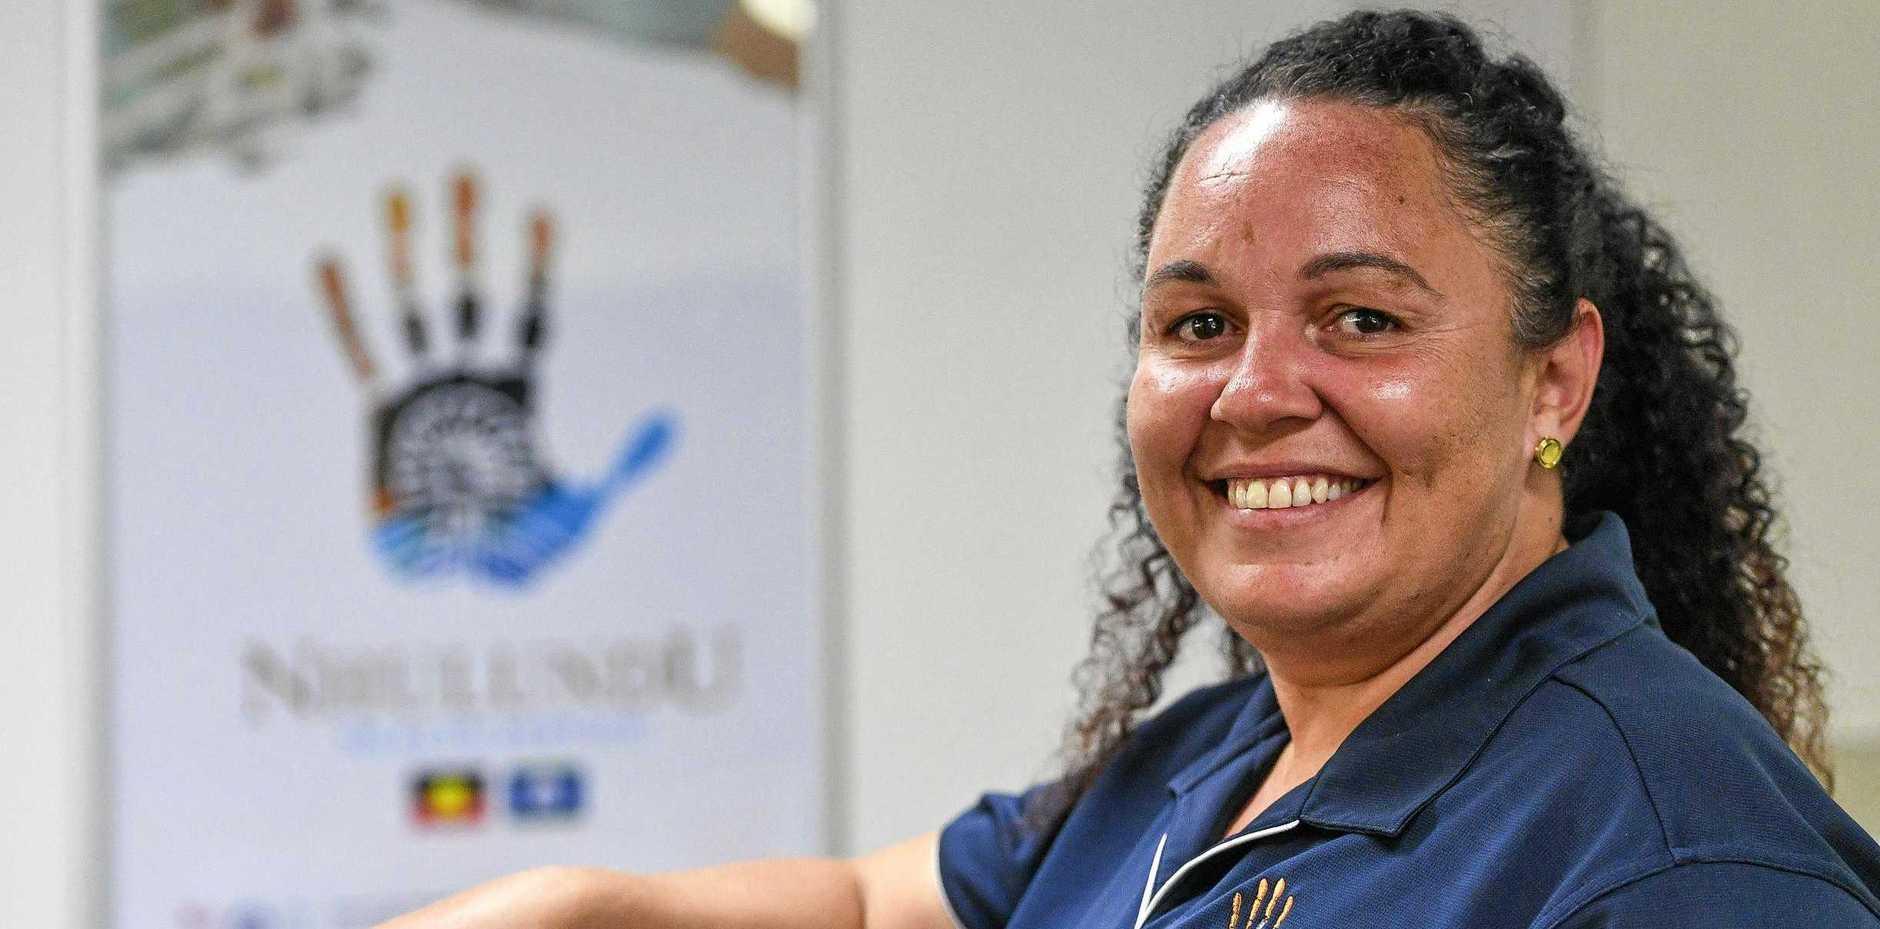 SHOWCASE: Nhulundu Health Service business services co-ordinator Naomi Jackson is looking forward to NAIDOC Week.